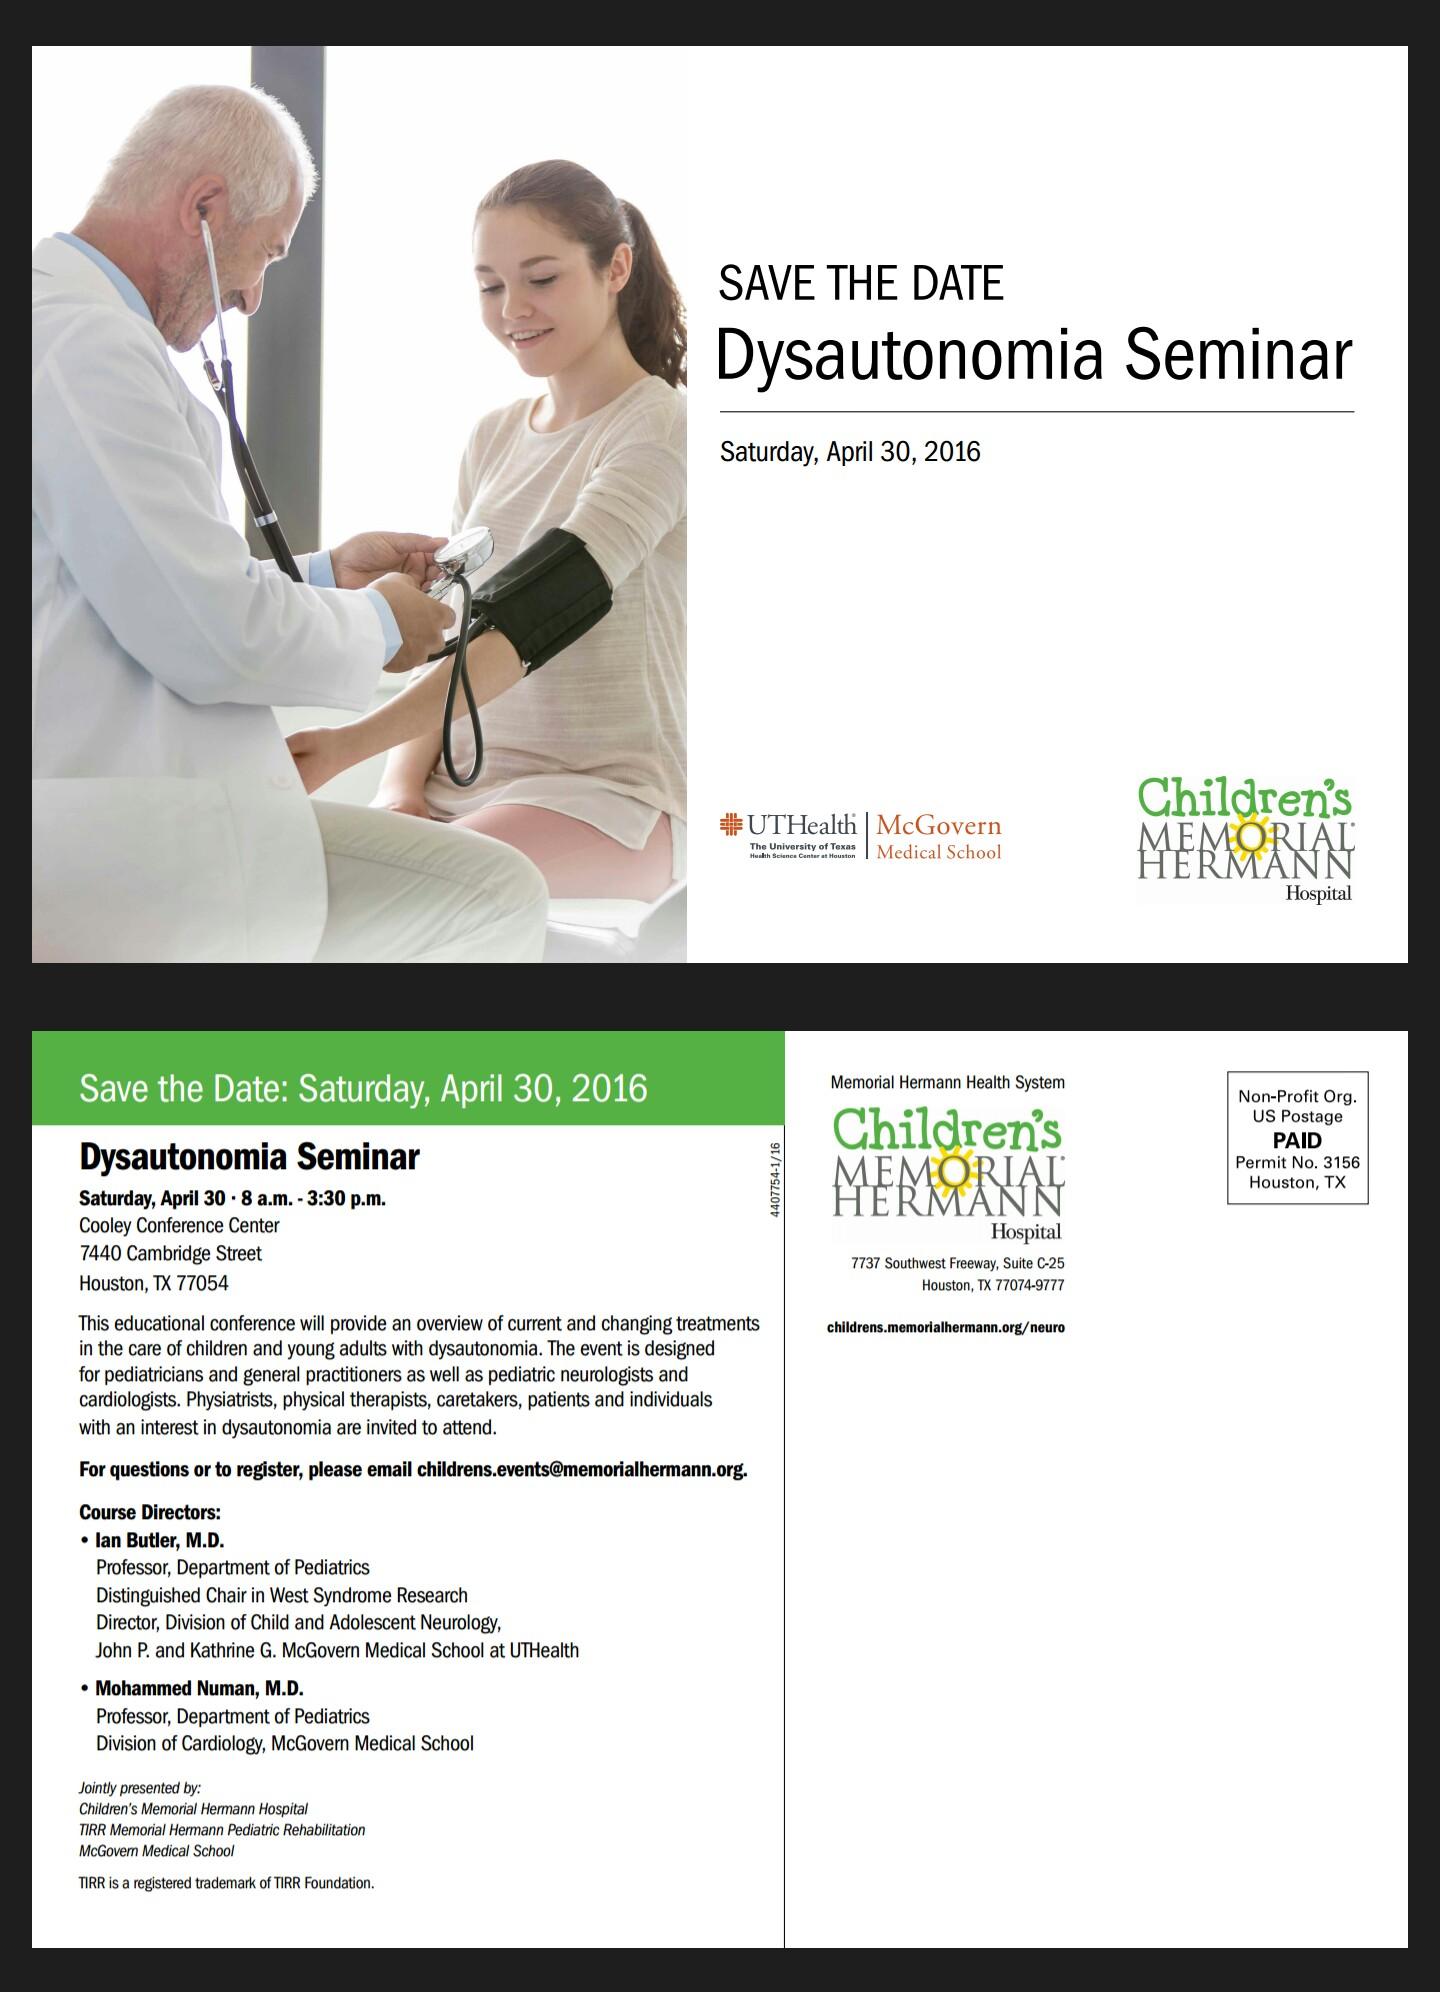 Dysautonomia Seminar (Houston, Tx) coming in April   Mik's